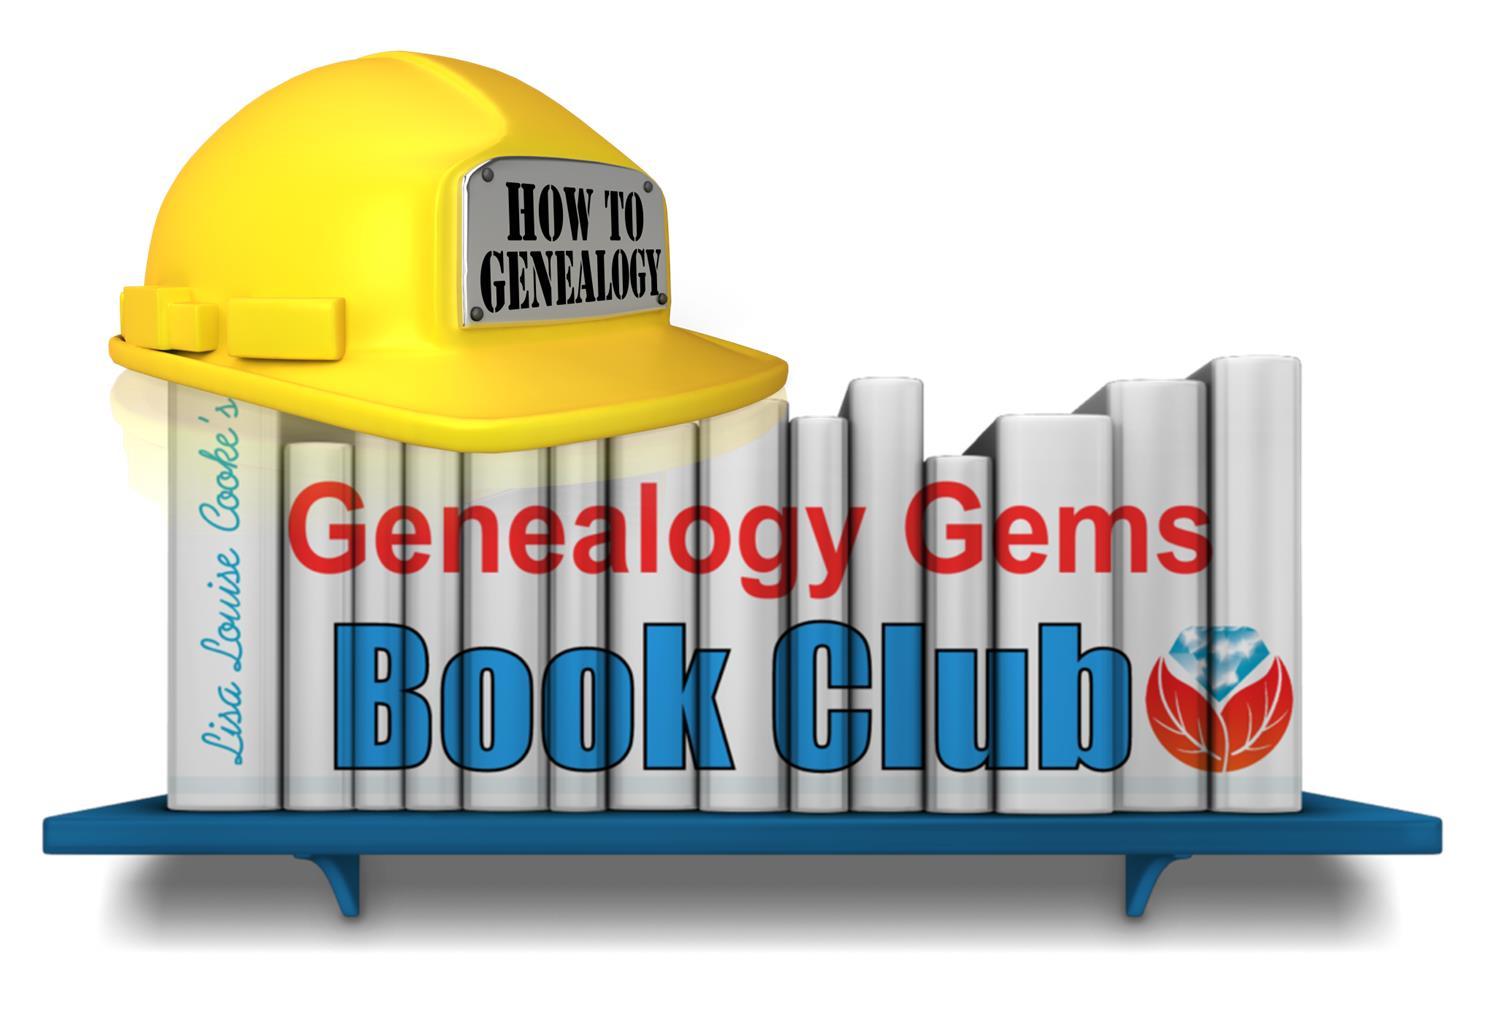 How to Genealogy LOGO